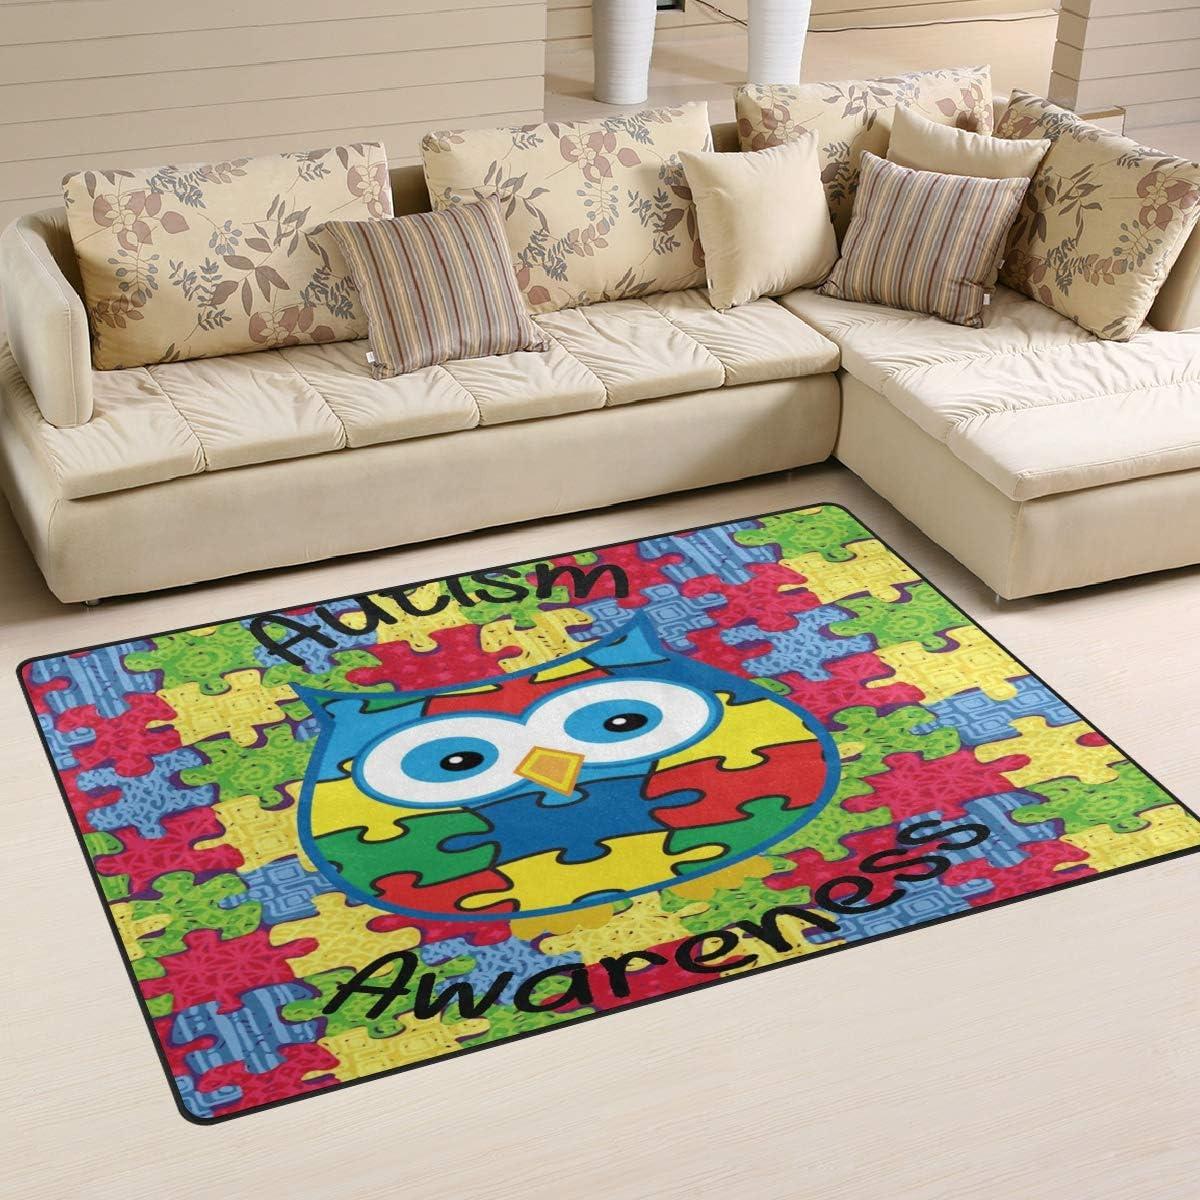 Ainans Autism Awareness Owl Area Rug Seasonal Wrap Introduction Floor Max 76% OFF Mat Carpet Non-Slip D